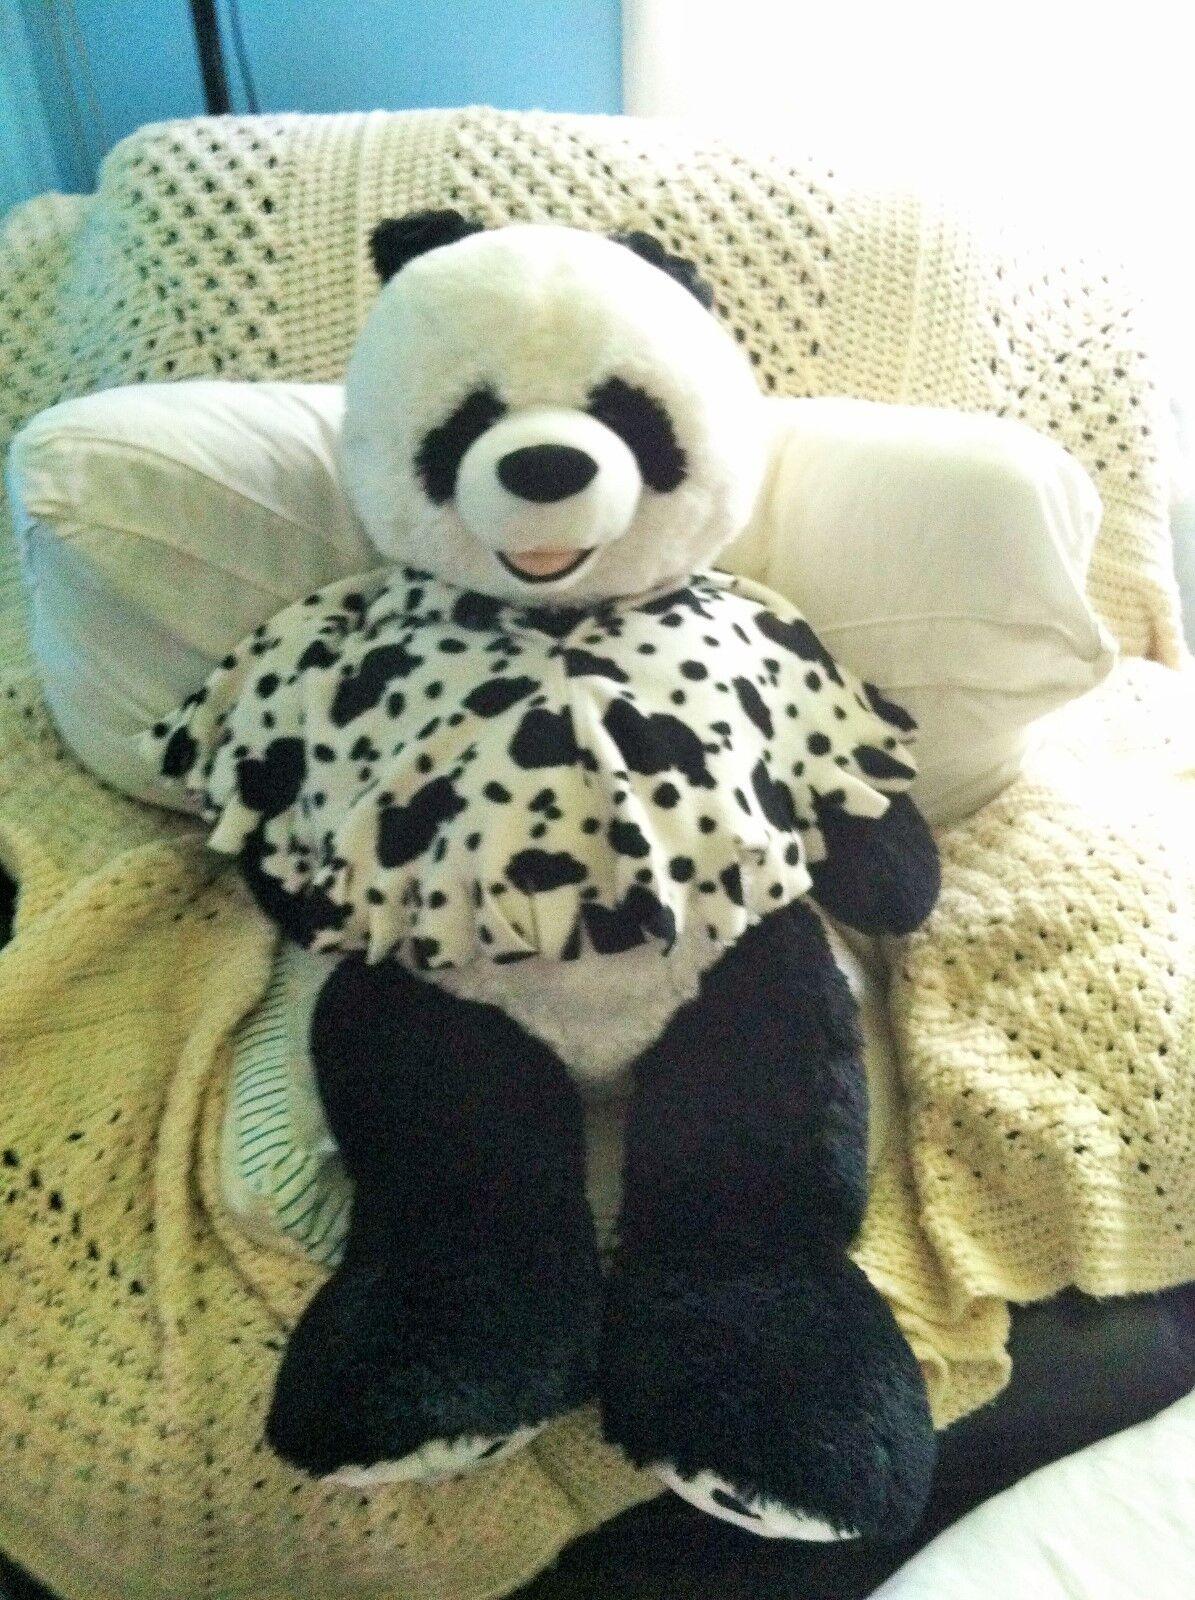 LARGE JUMBO HUGE Panda Bear Stuffed Animal Plush Sitting Toy Hugfun 35